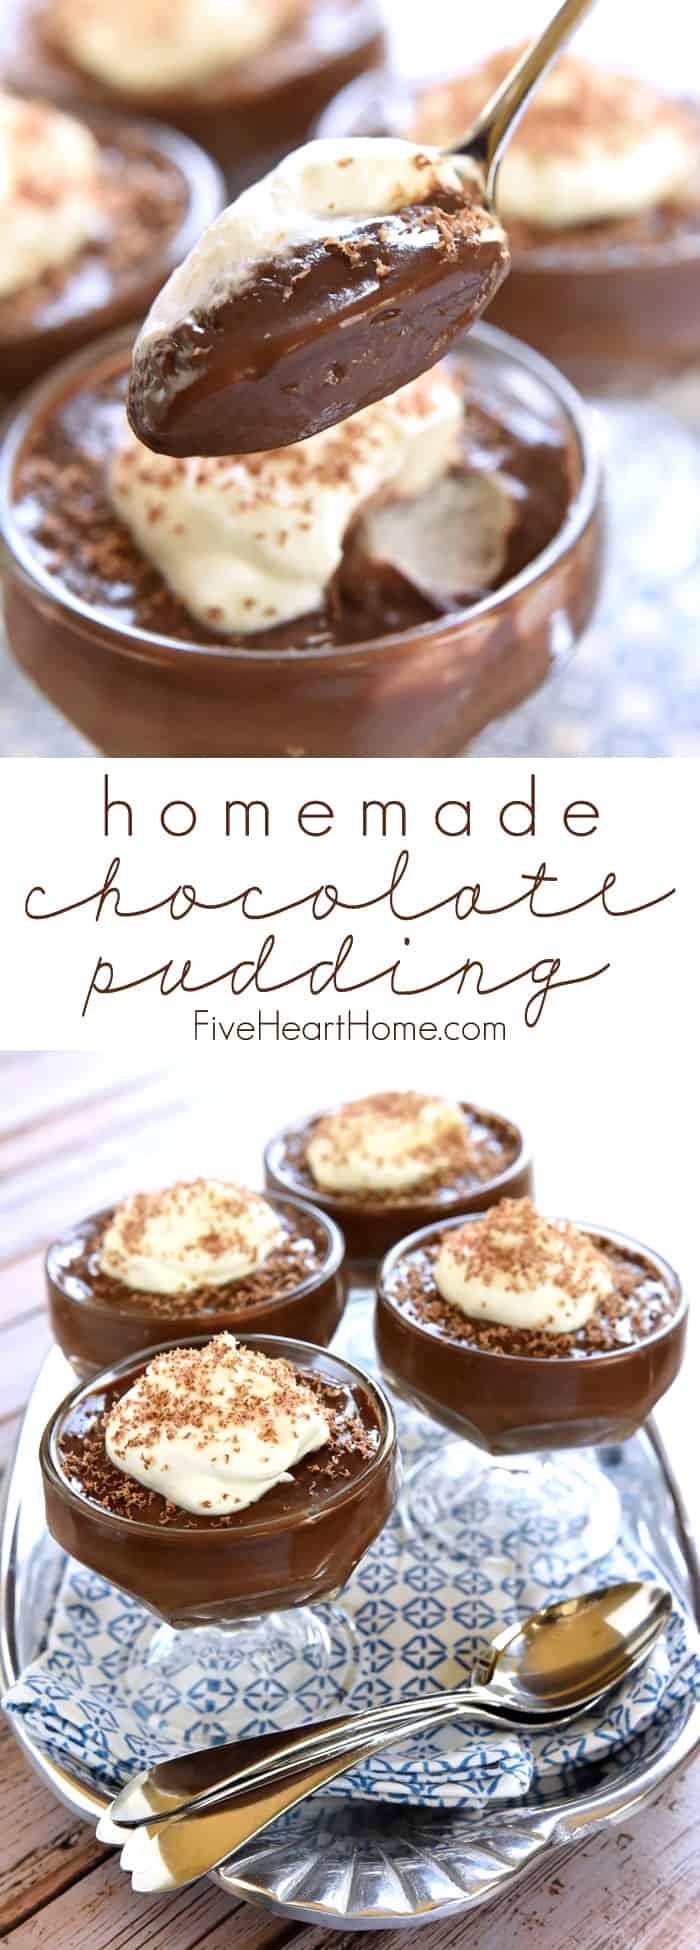 Easy Chocolate Puddings Recipes  Homemade Chocolate Pudding